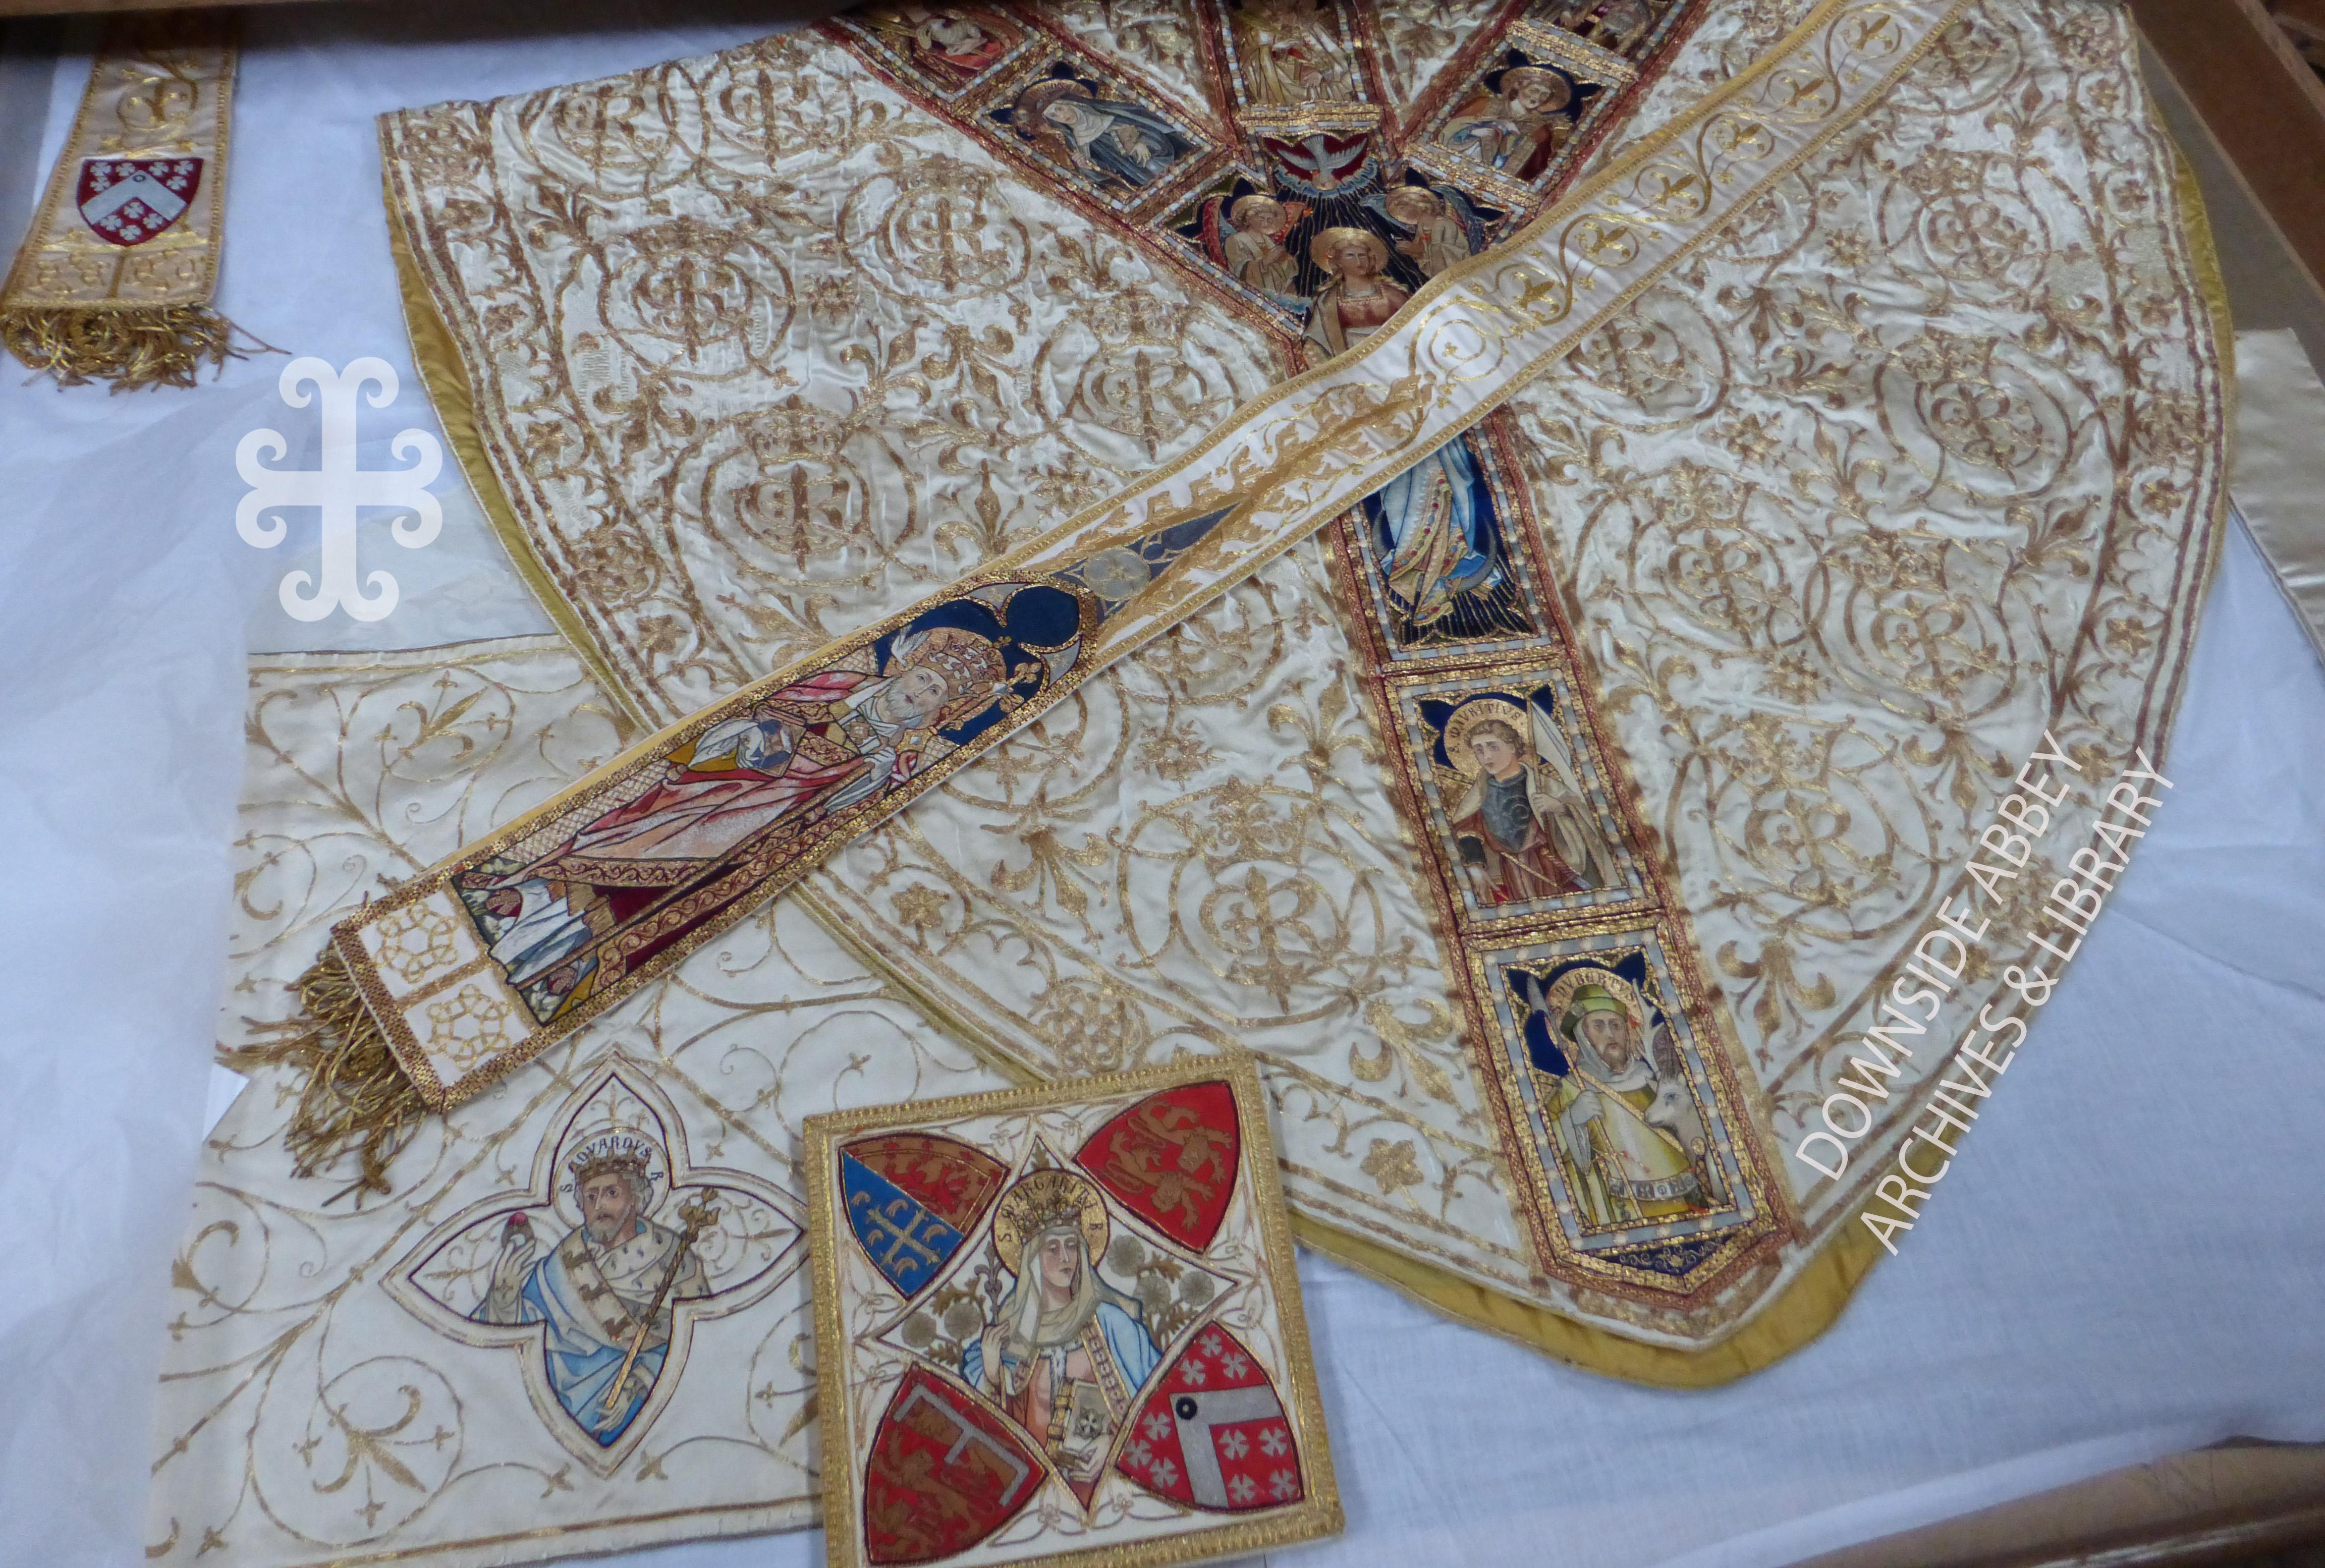 Downside Abbey exhibition